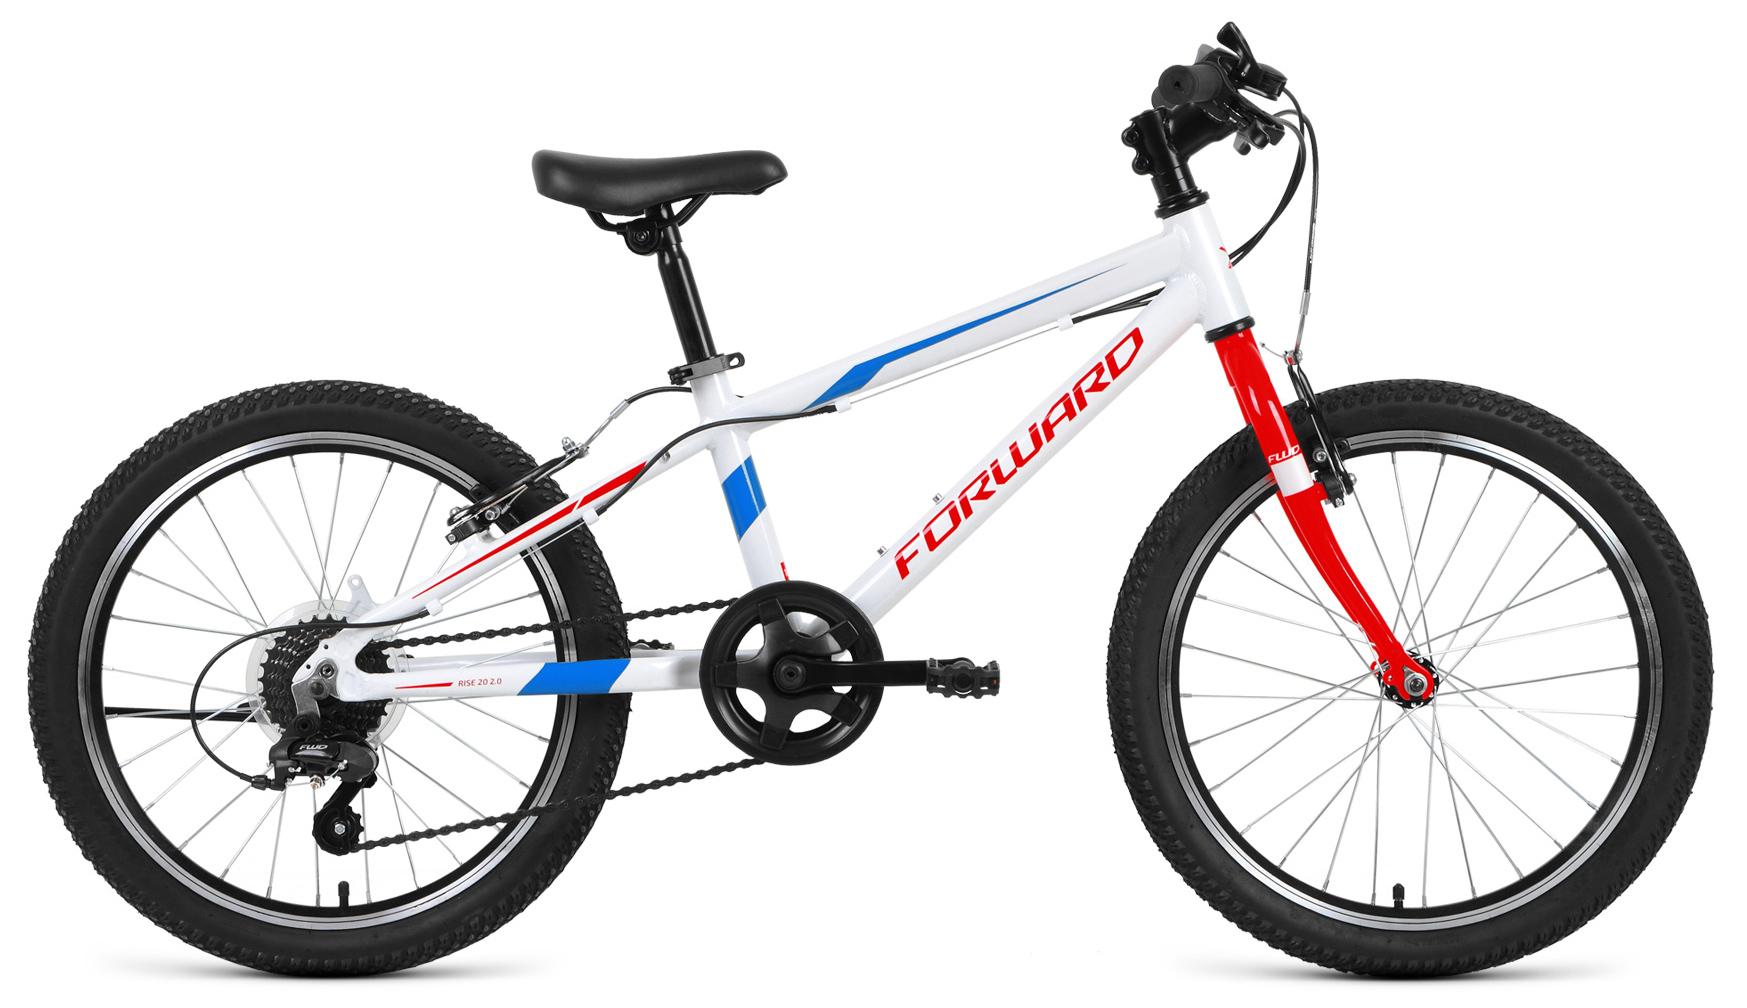 Велосипед Forward Rise 20 2.0 2019 велосипед forward nitro 18 2019